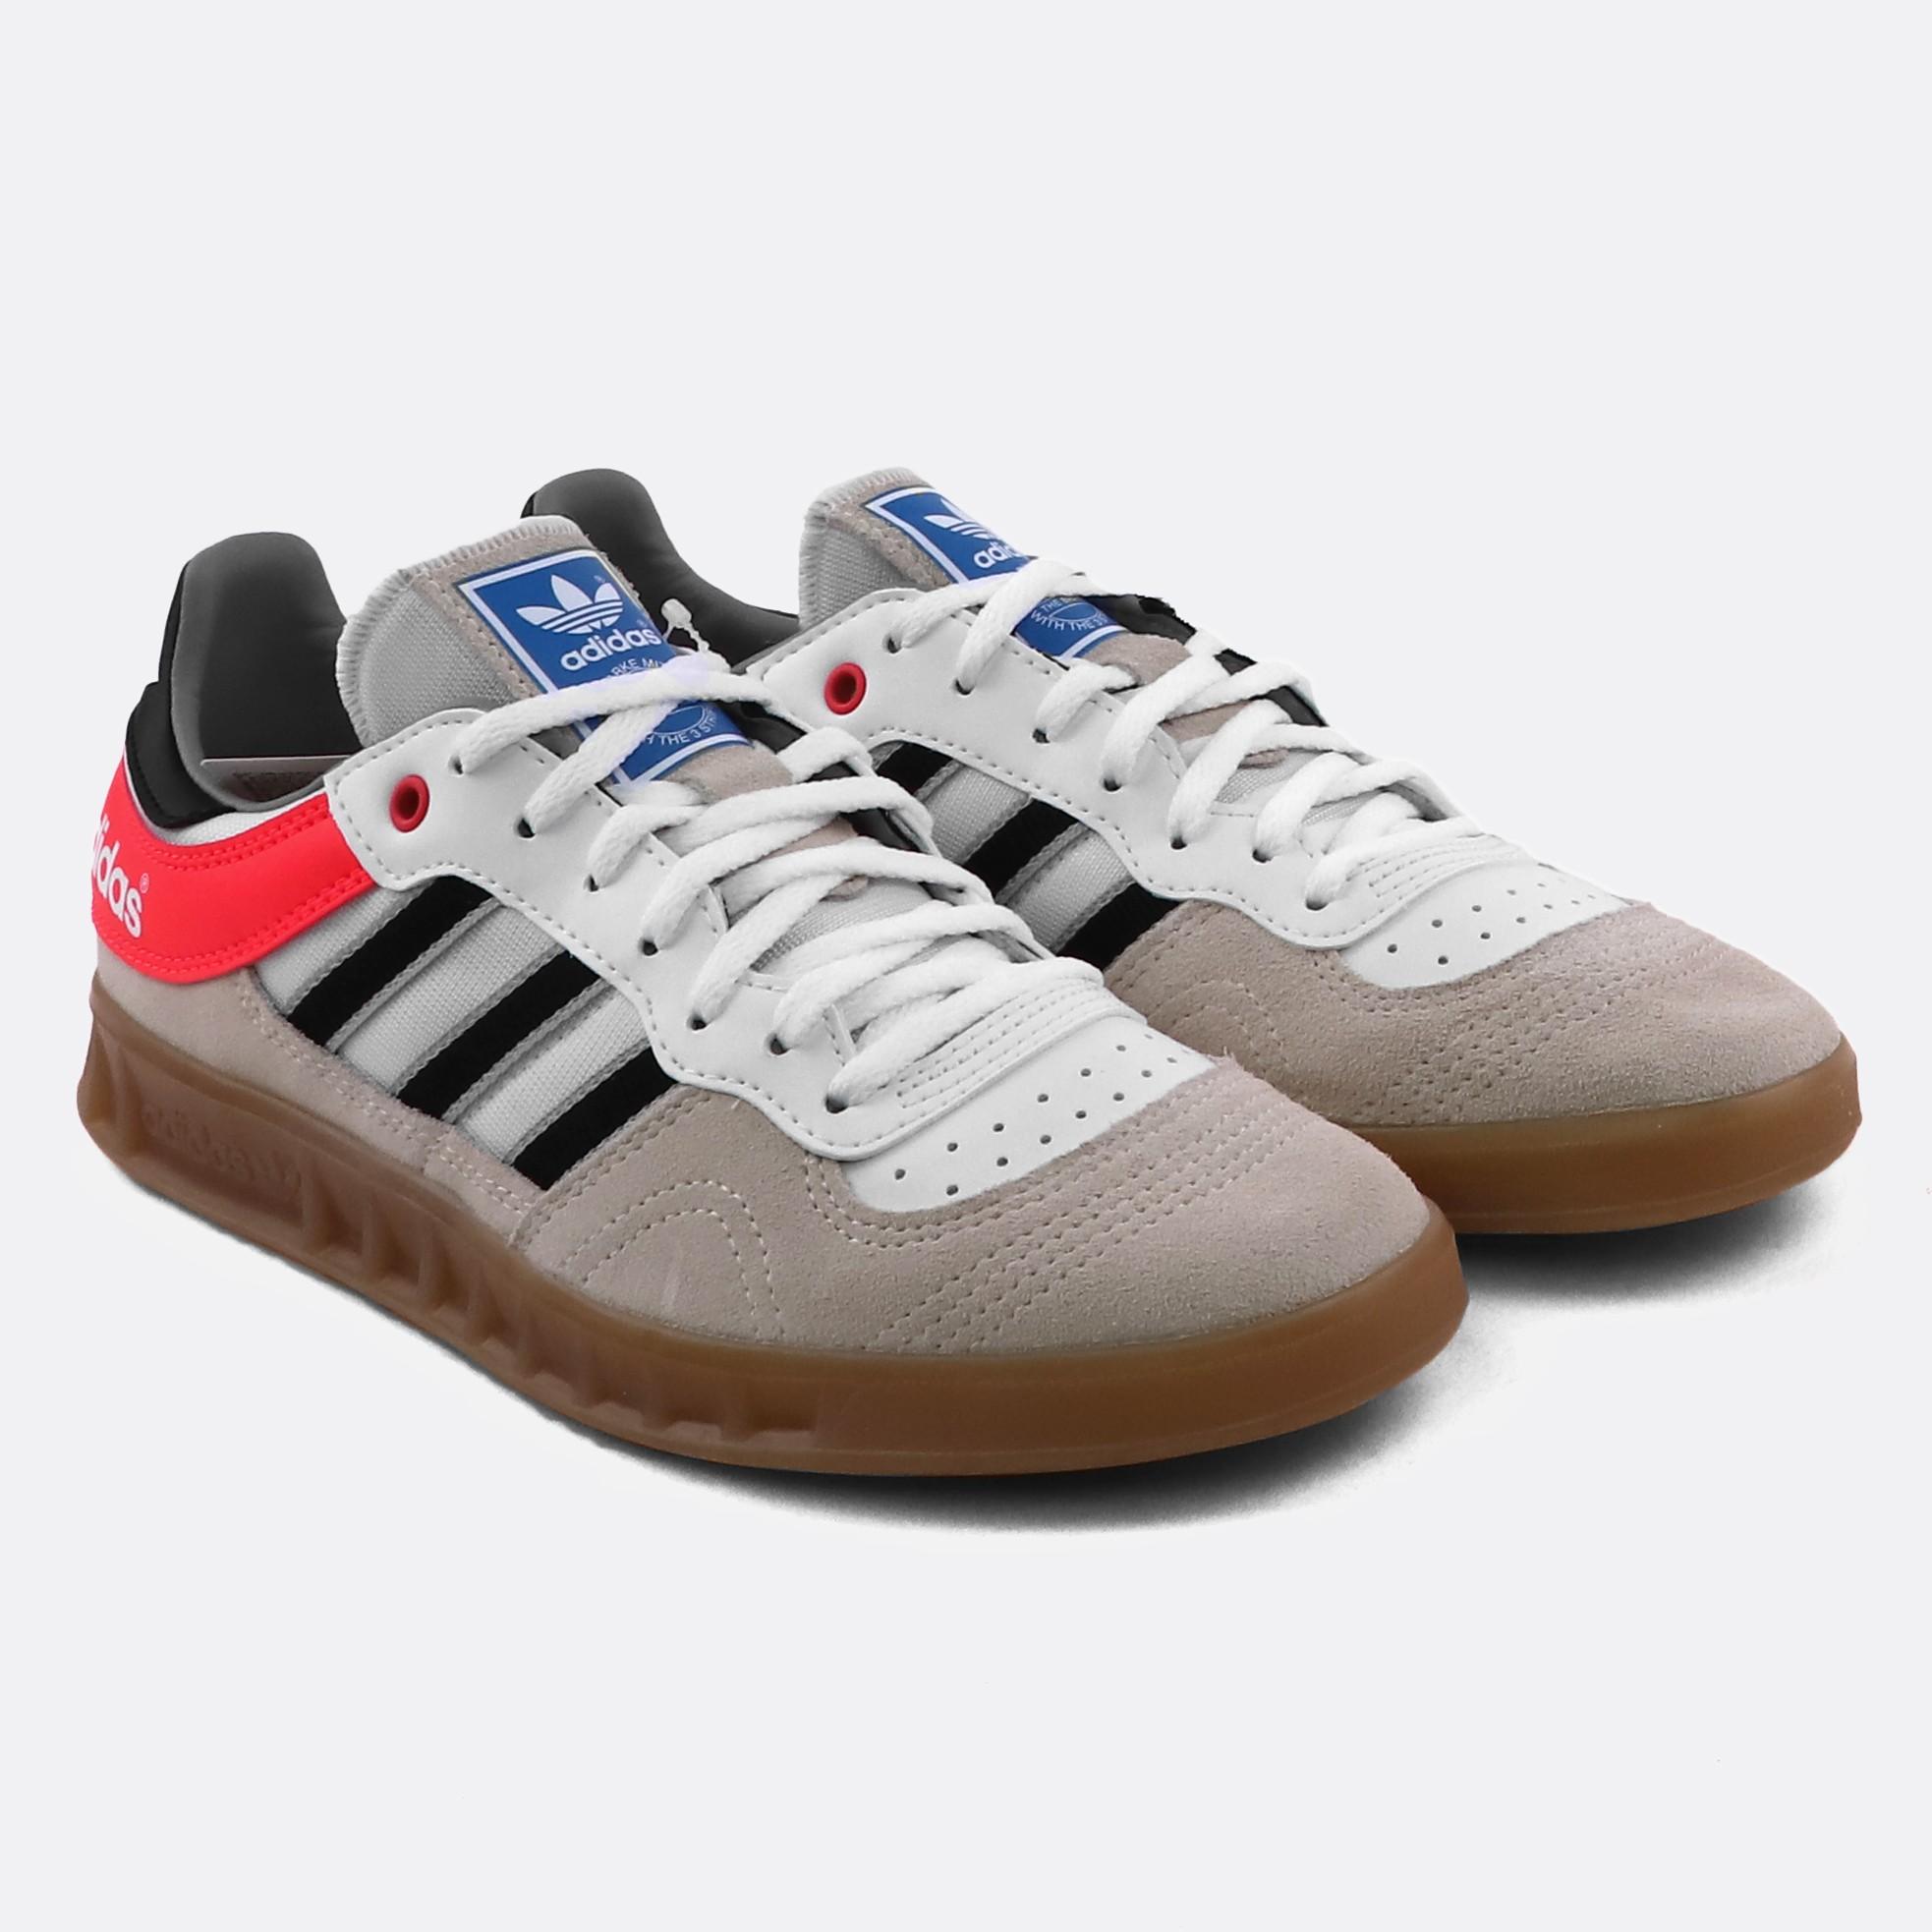 online store 7644f 4437a HANDBALL TOP CHALK WHITE  CORE BLACK  SOLAR RED